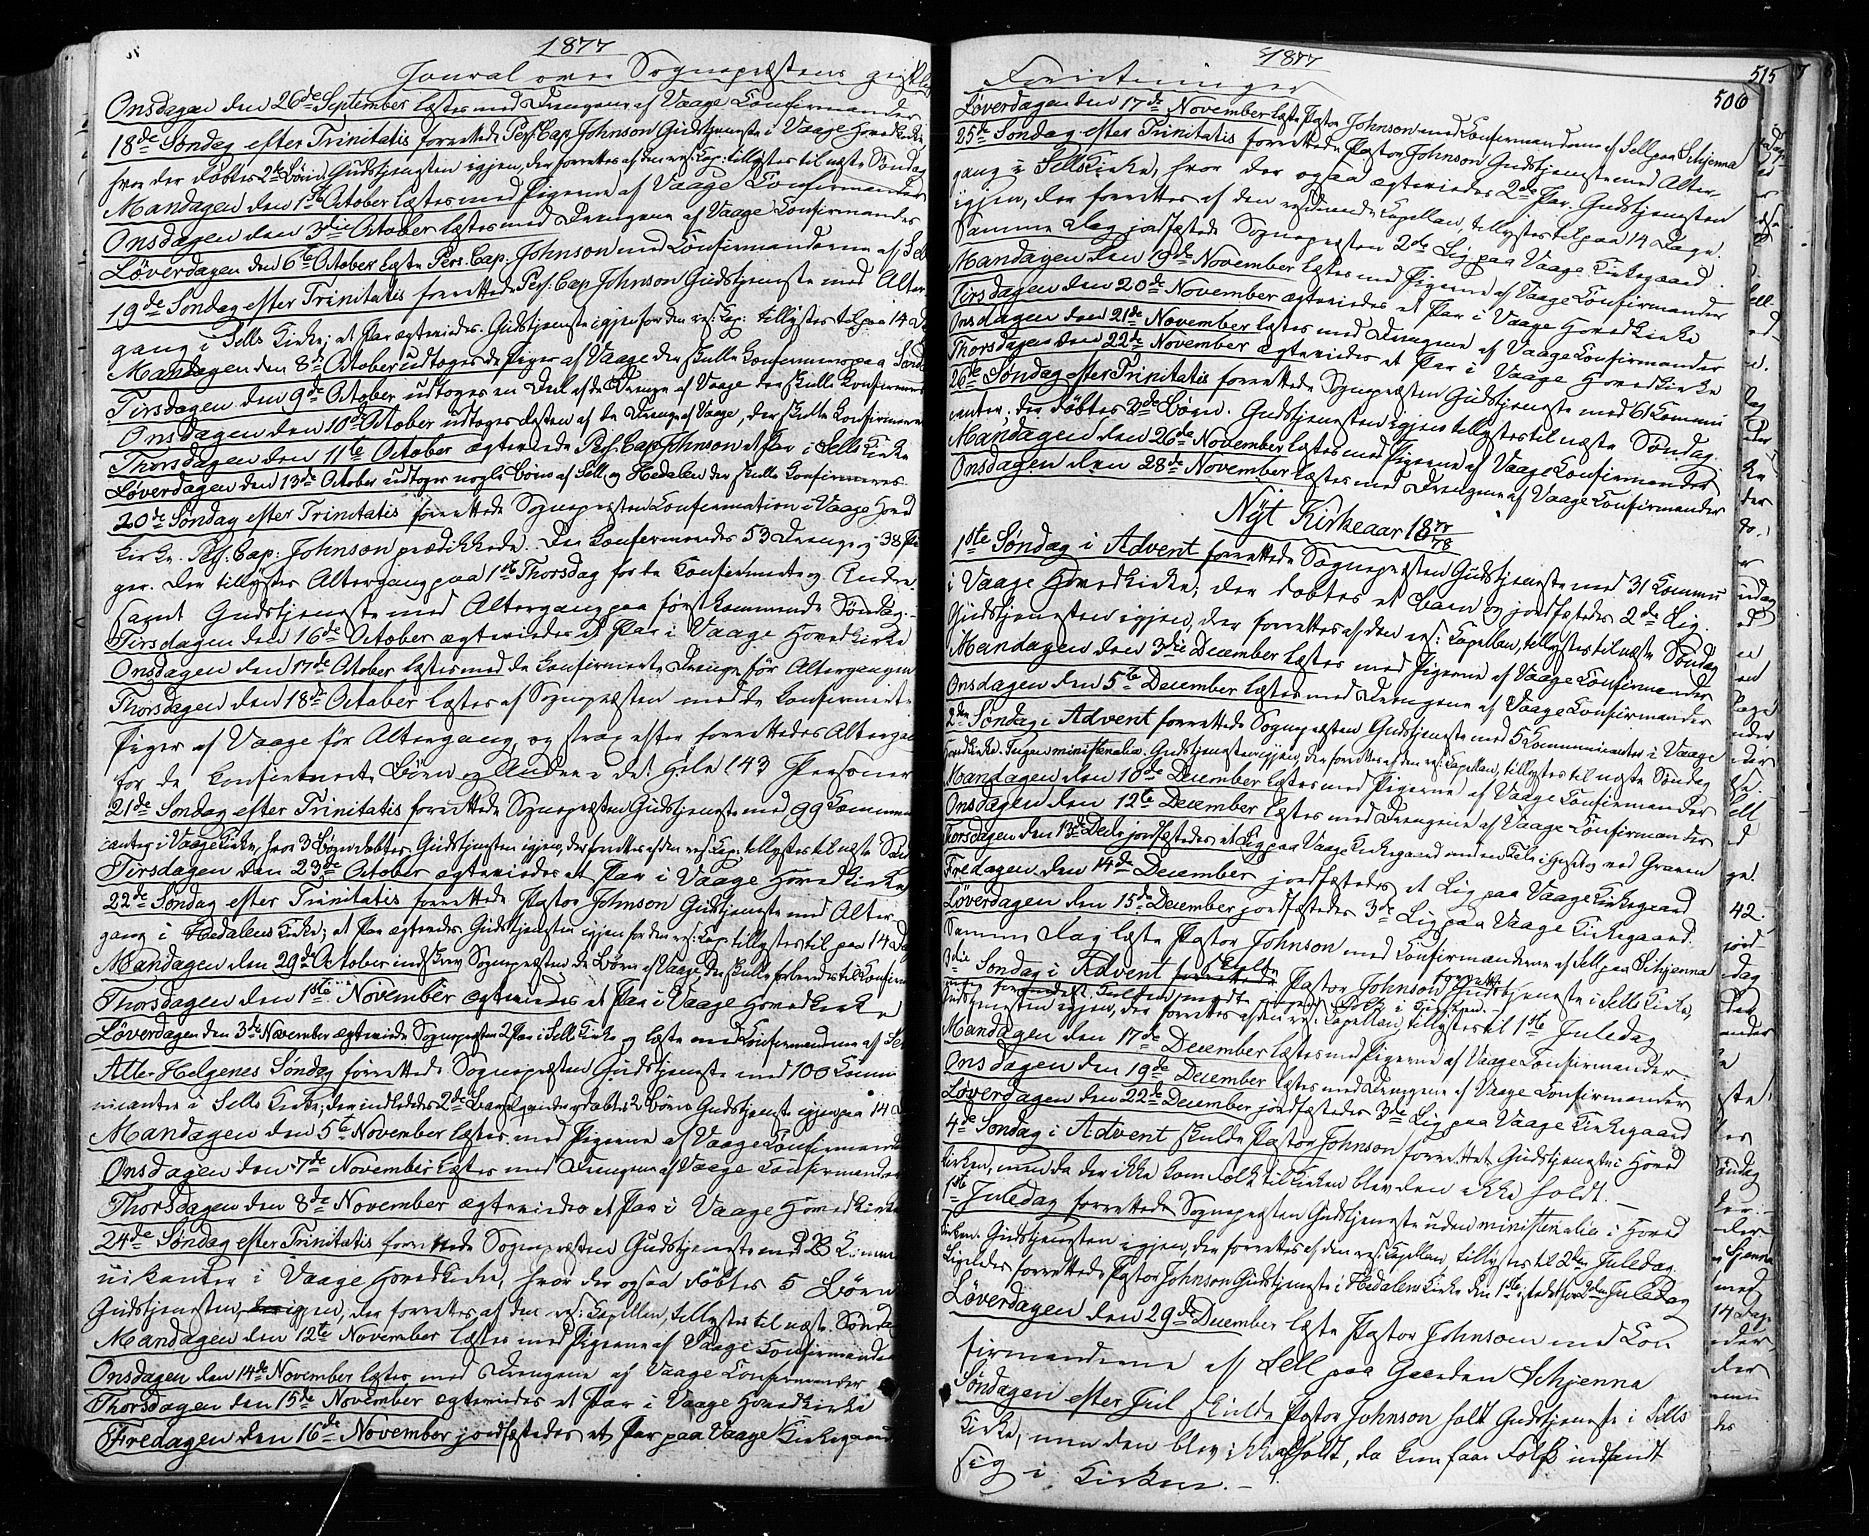 SAH, Vågå prestekontor, Ministerialbok nr. 7 /1, 1872-1886, s. 506